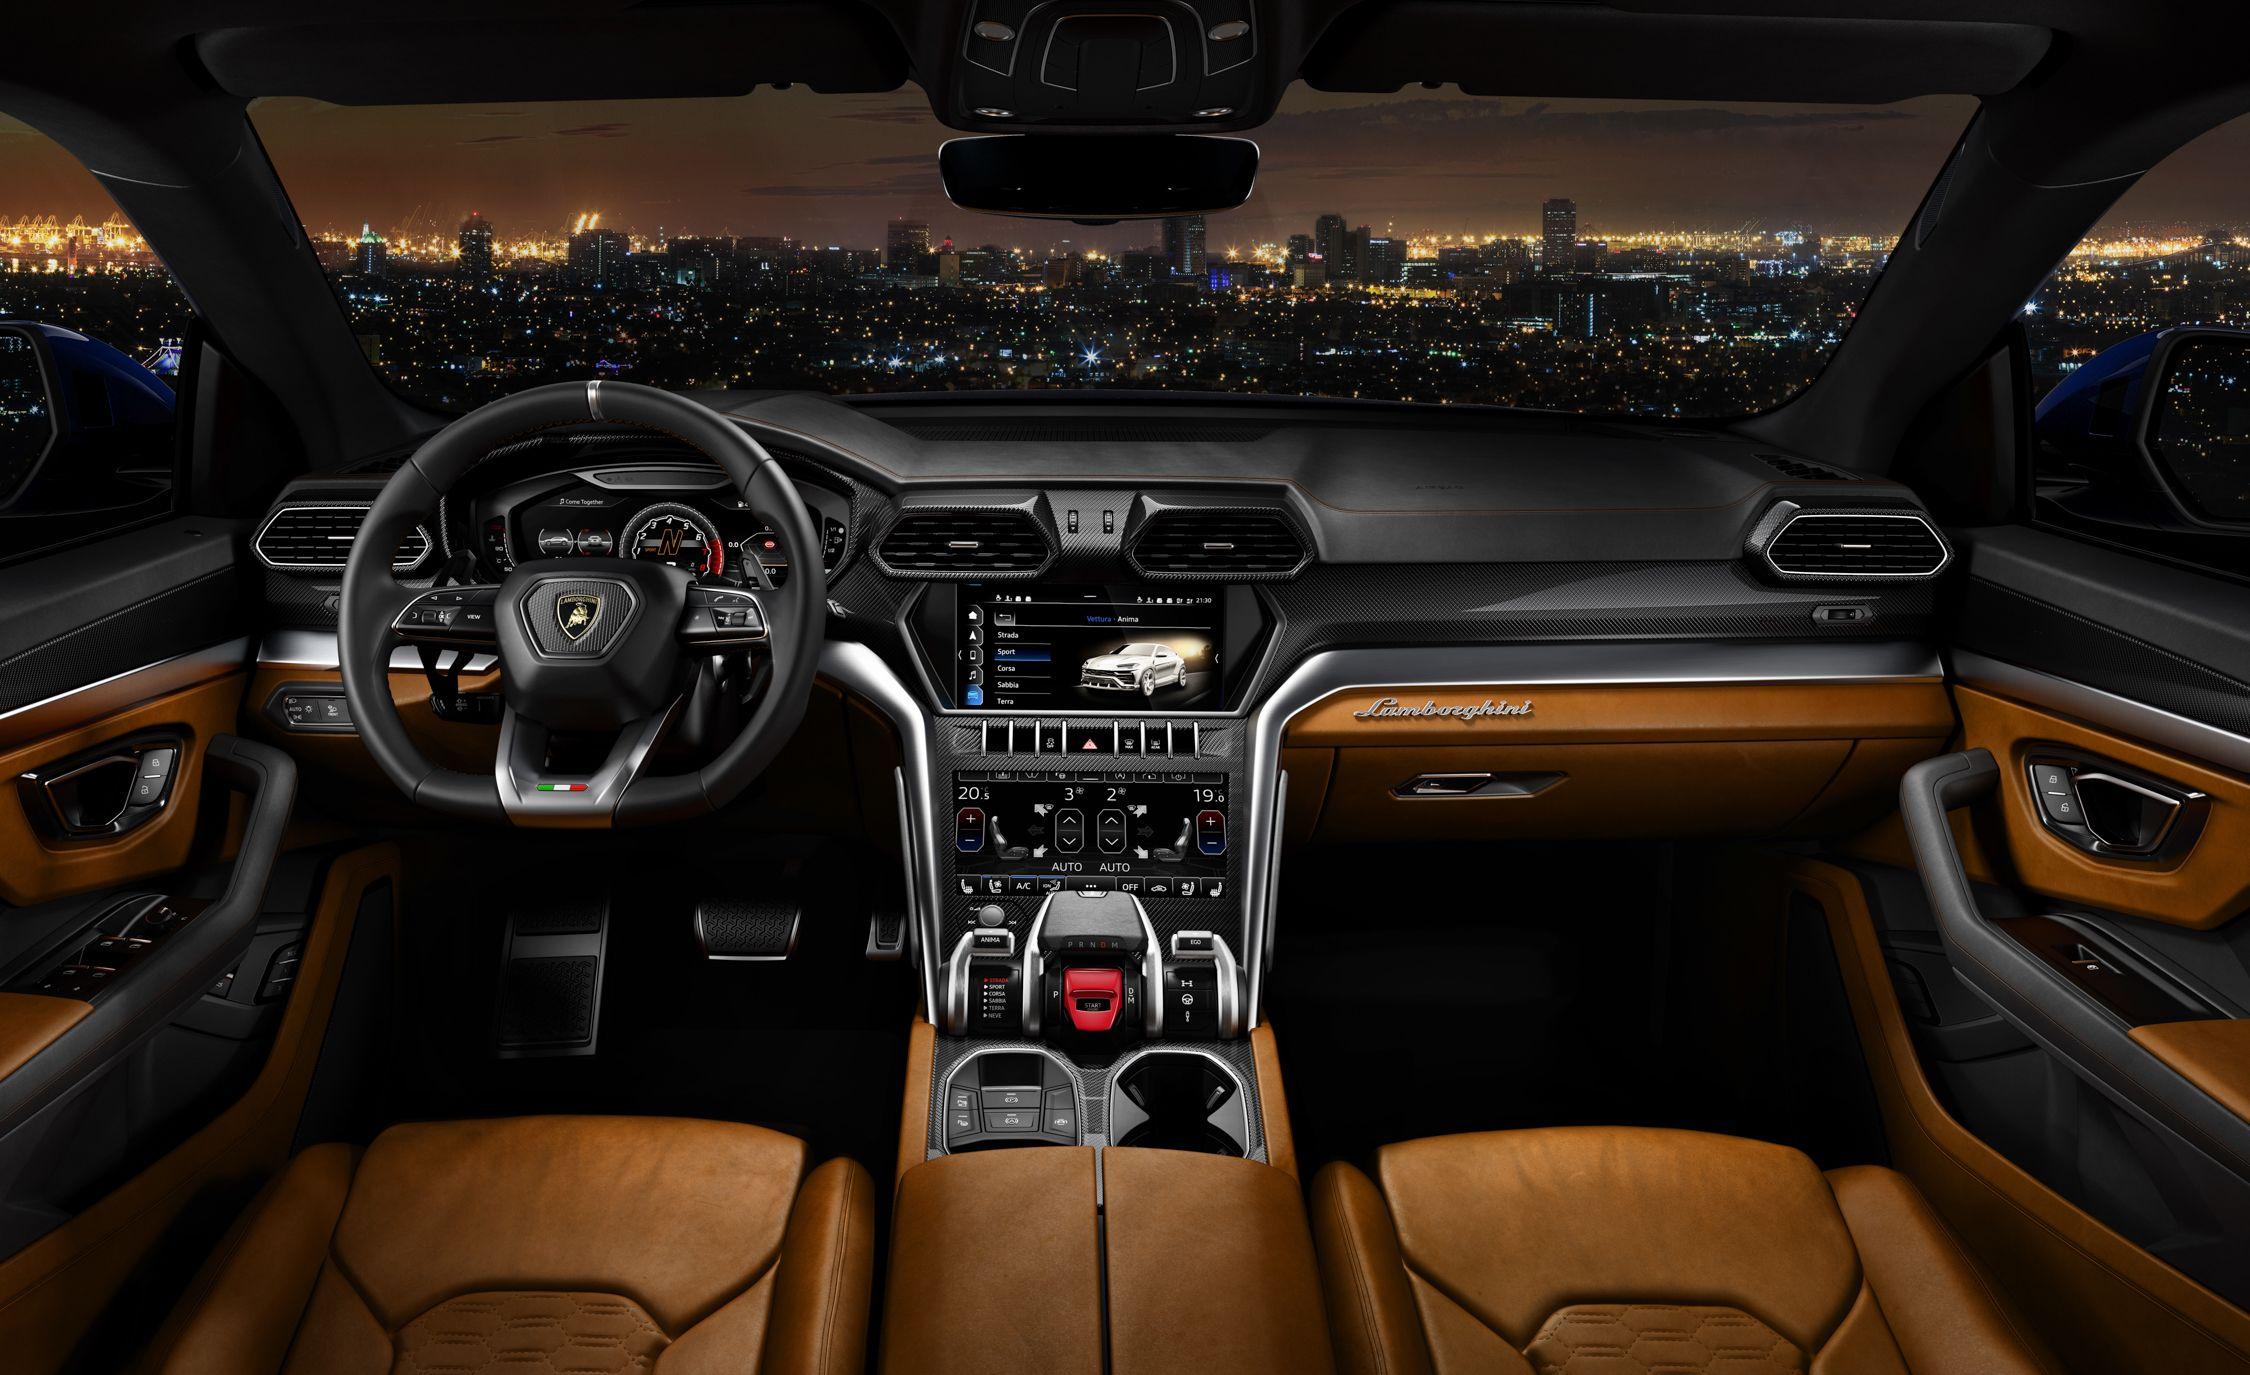 Lamborghini Suv Price >> Lamborghini Urus Reviews Lamborghini Urus Price Photos And